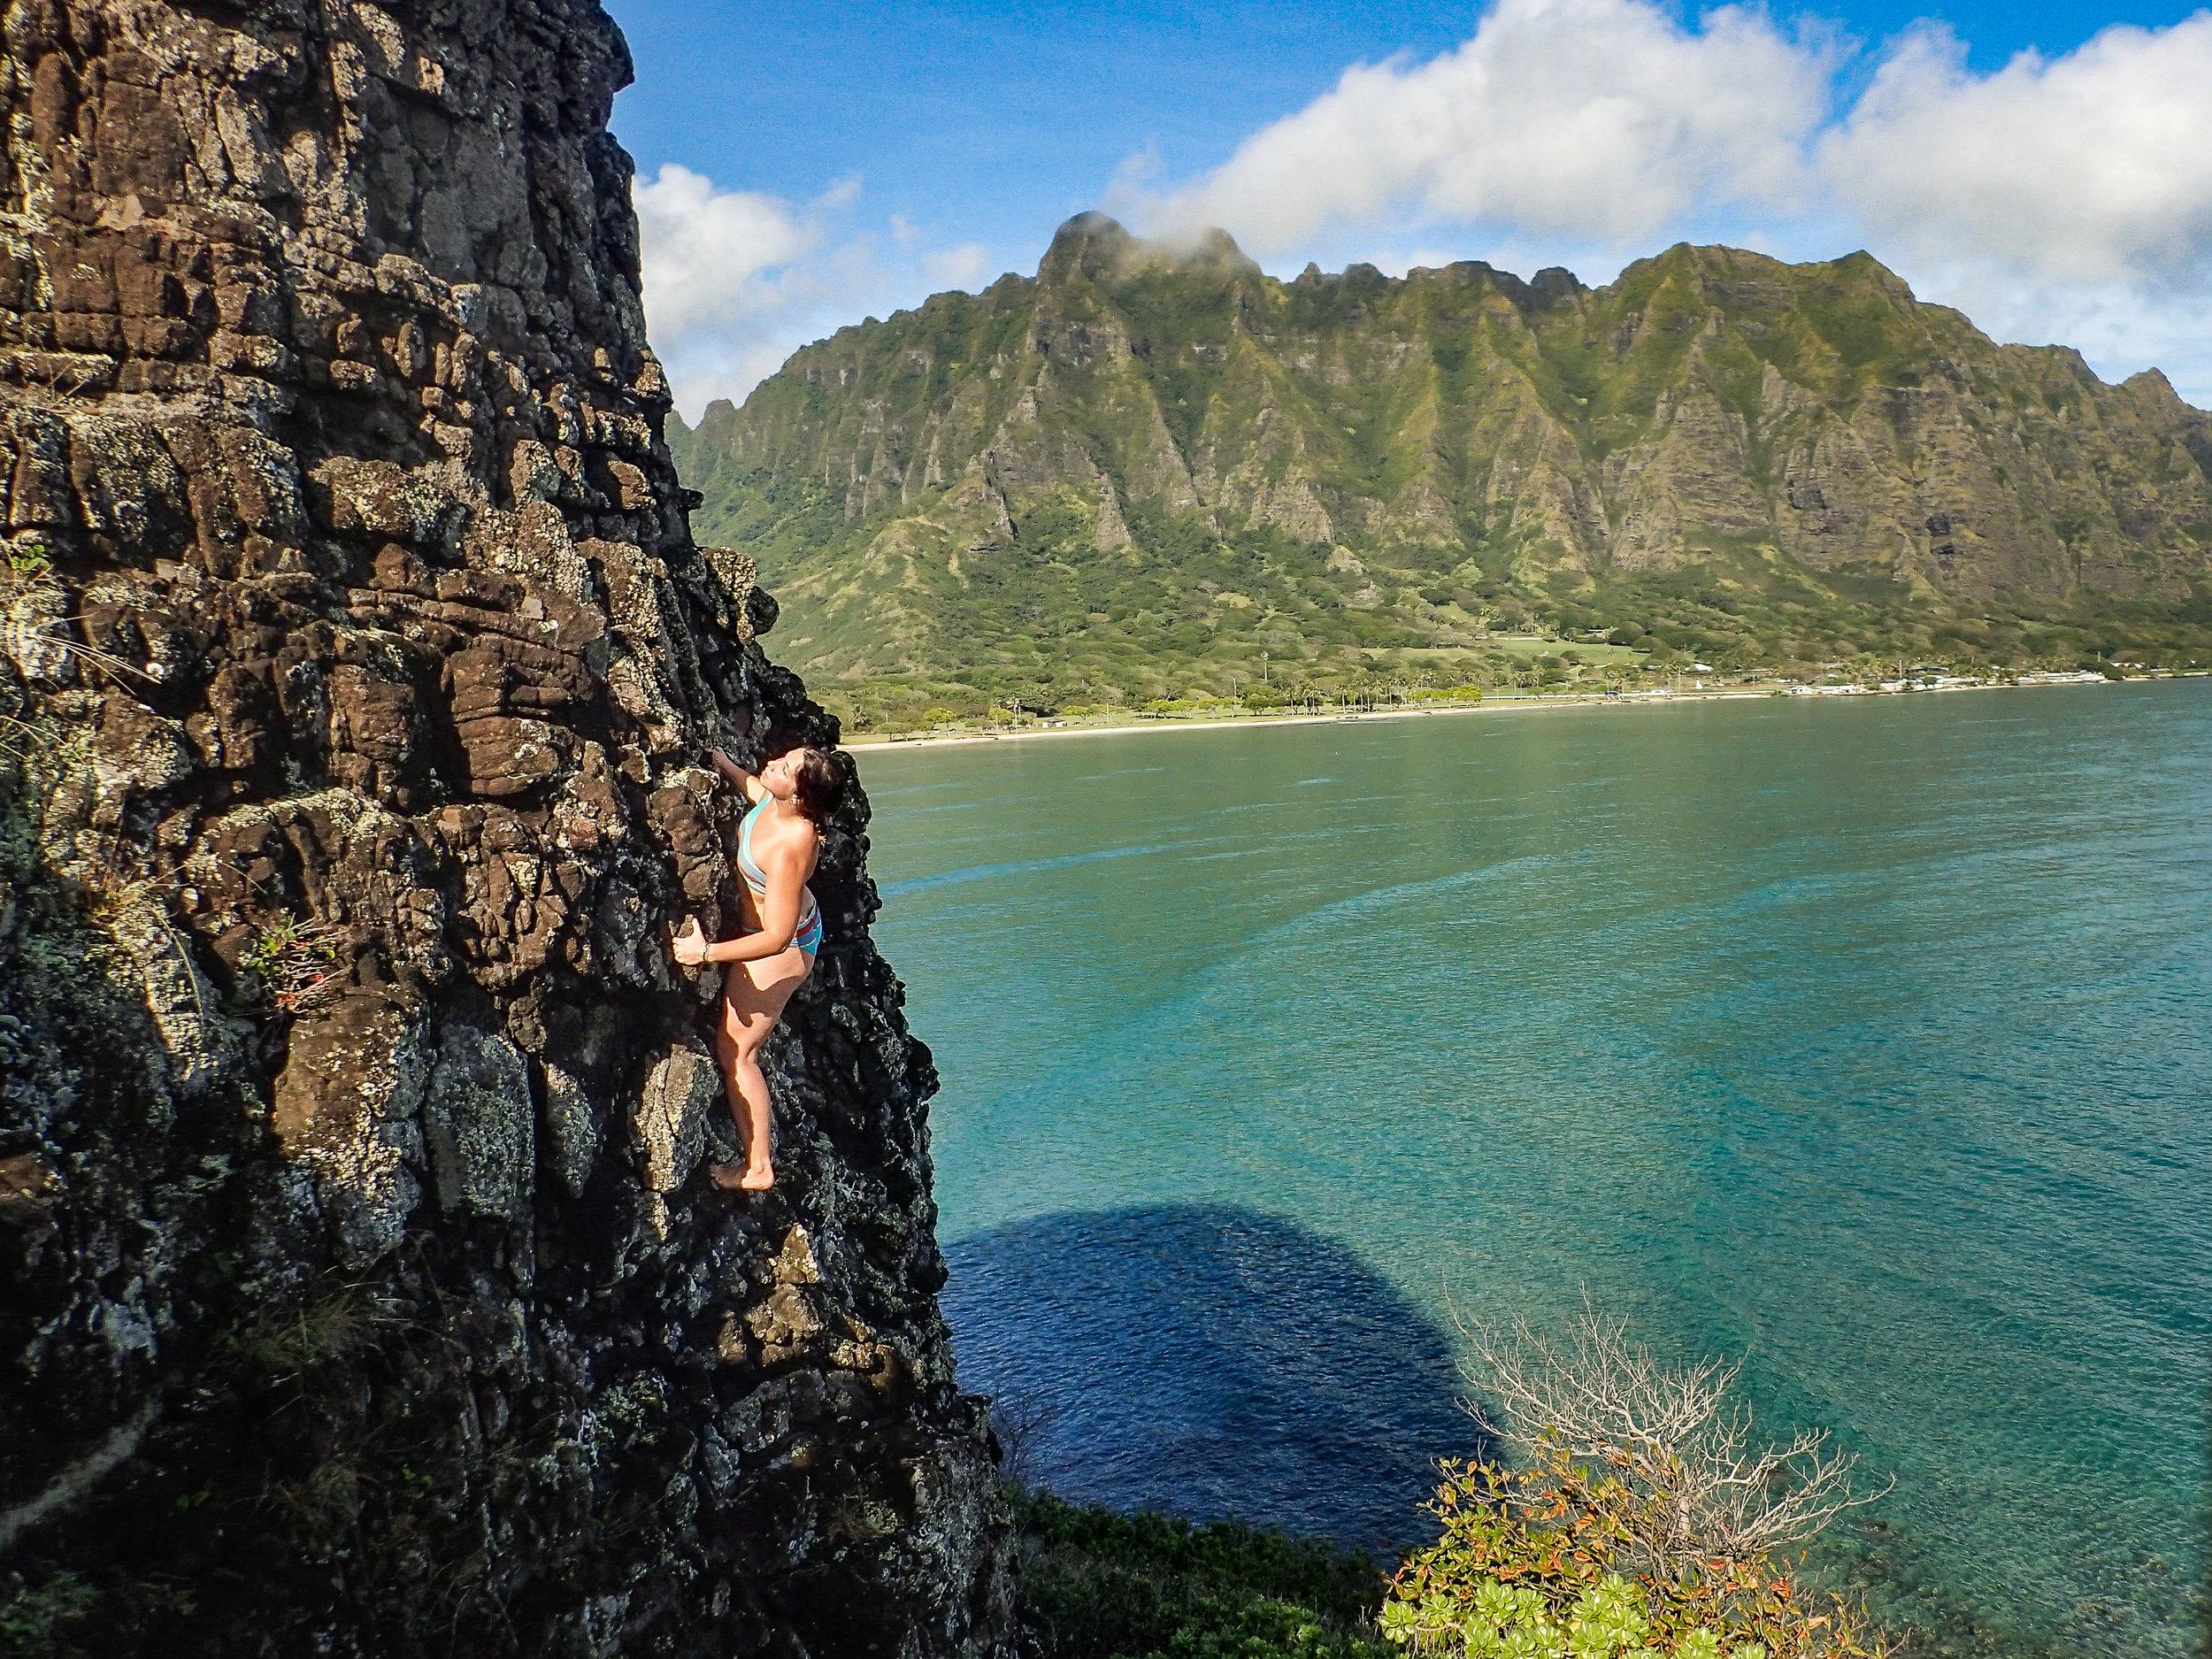 P_Tr_HI_Oahu_Olympus Images-287.jpg